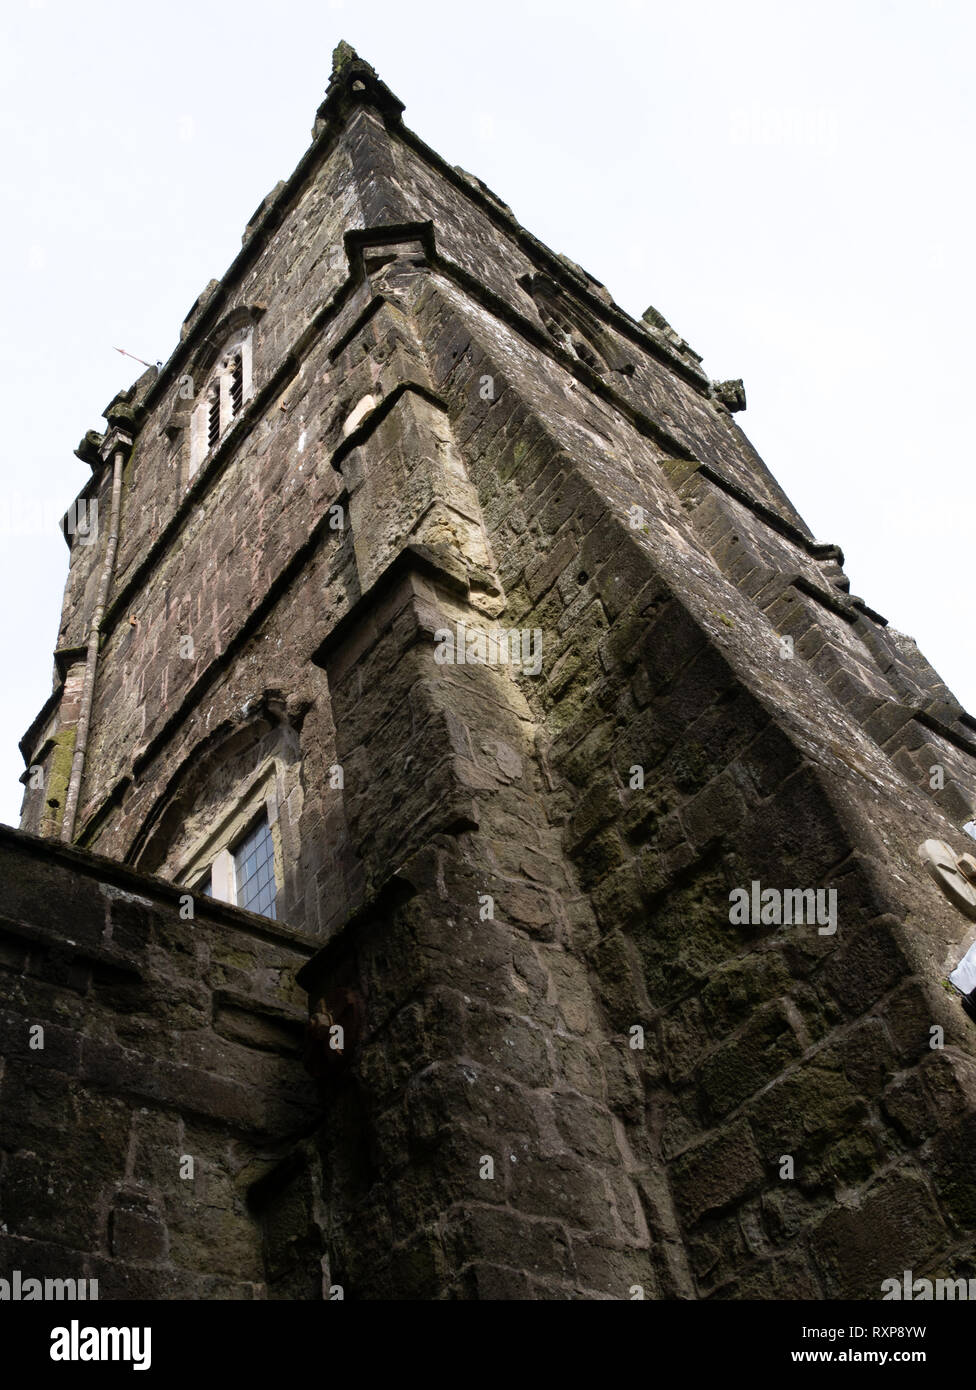 St Peter's church, Shaftesbury, Dorset, UK - Stock Image